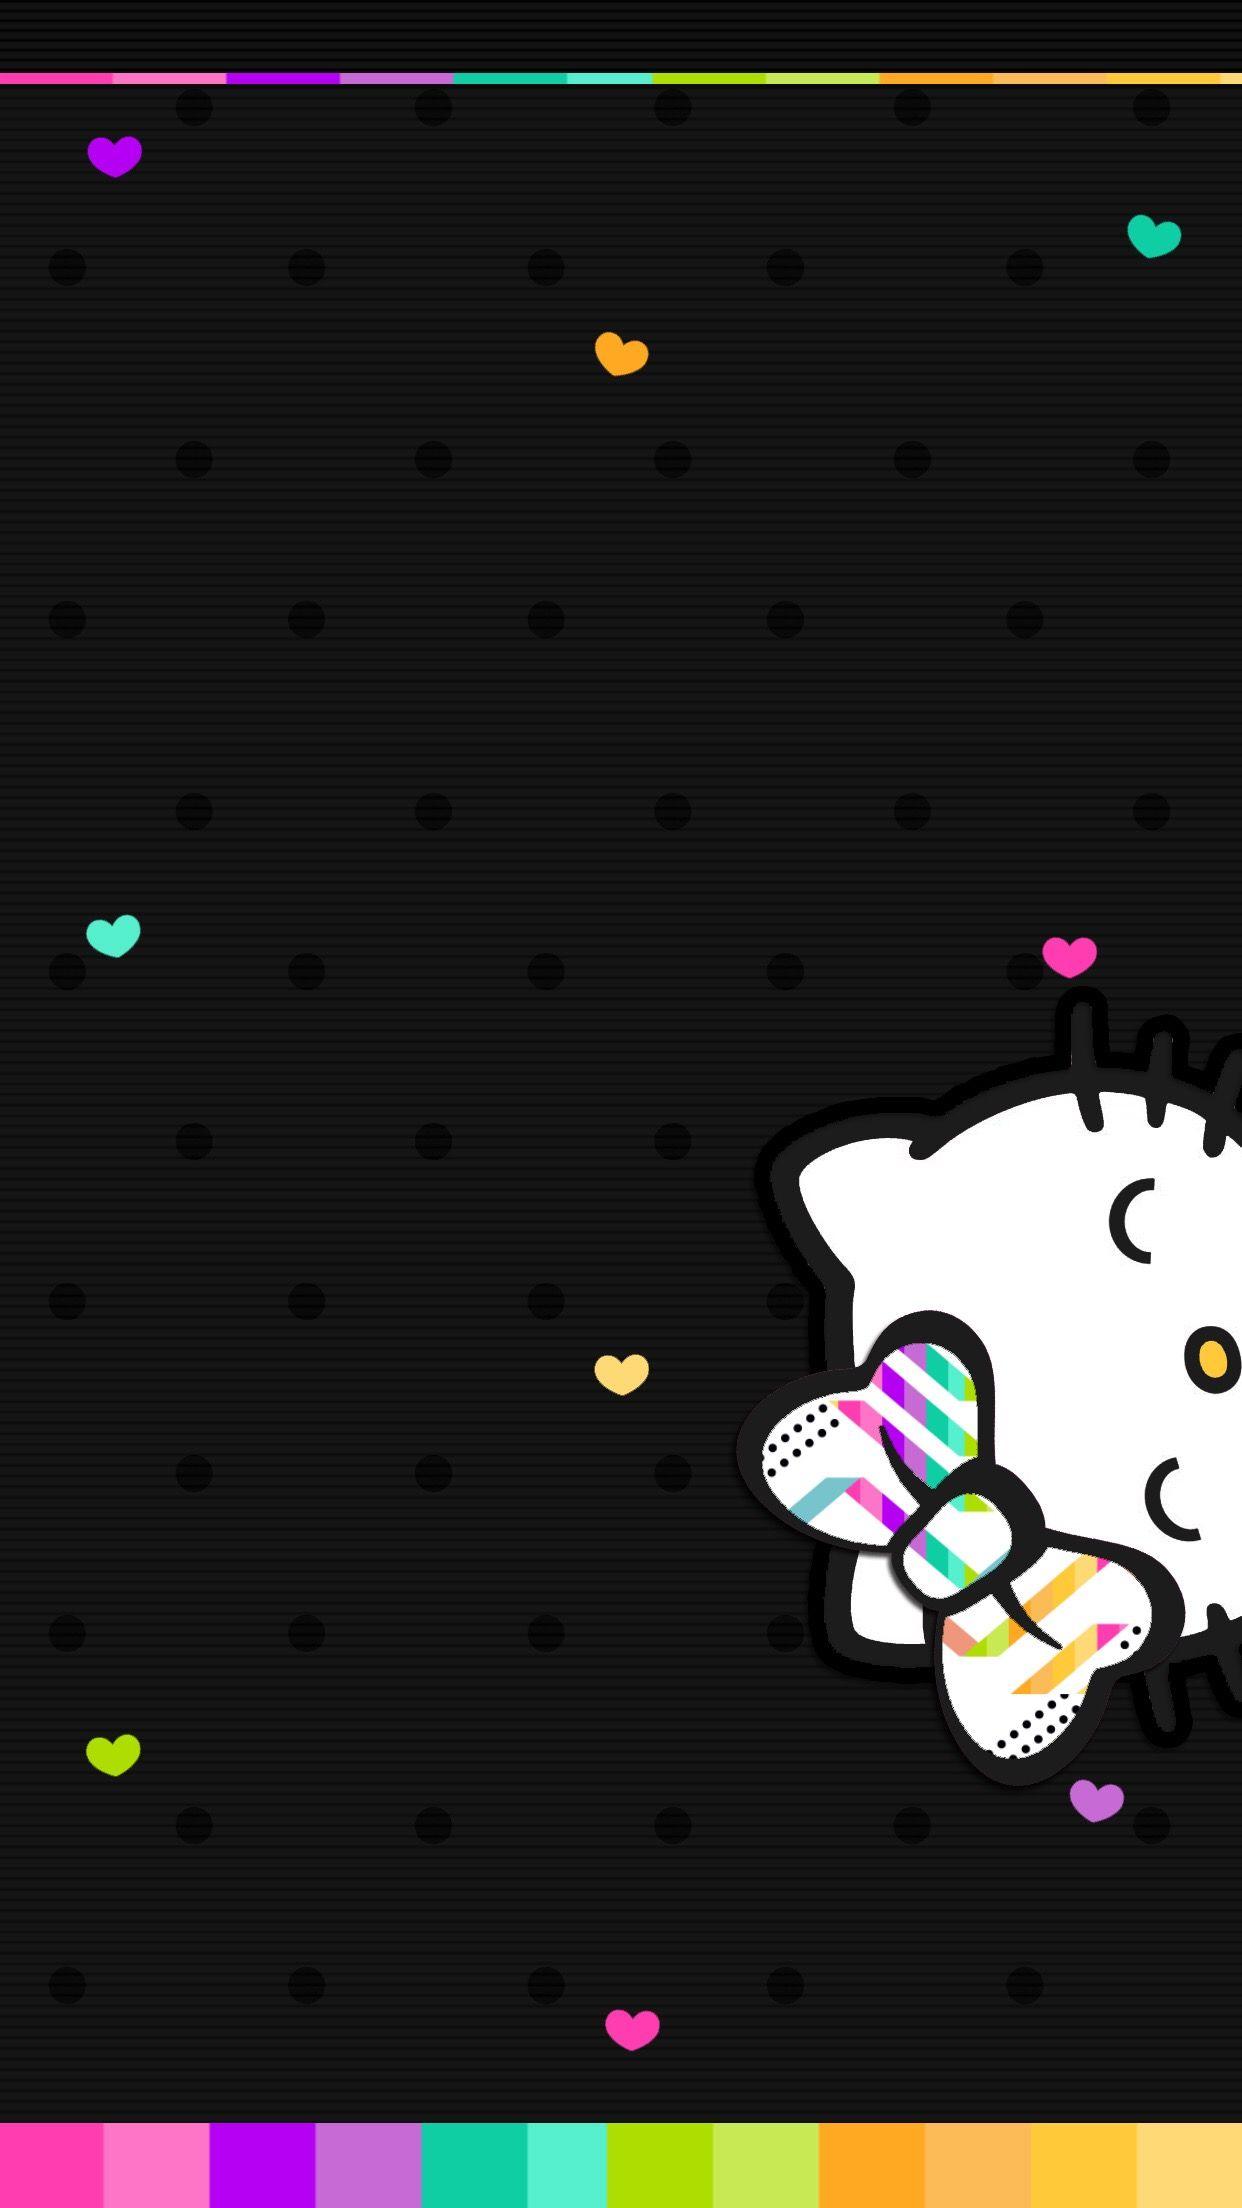 Download Wallpaper Hello Kitty Wall - 82d3d3f6113d889bf5f15e0982bc9e19  Snapshot_869573.jpg